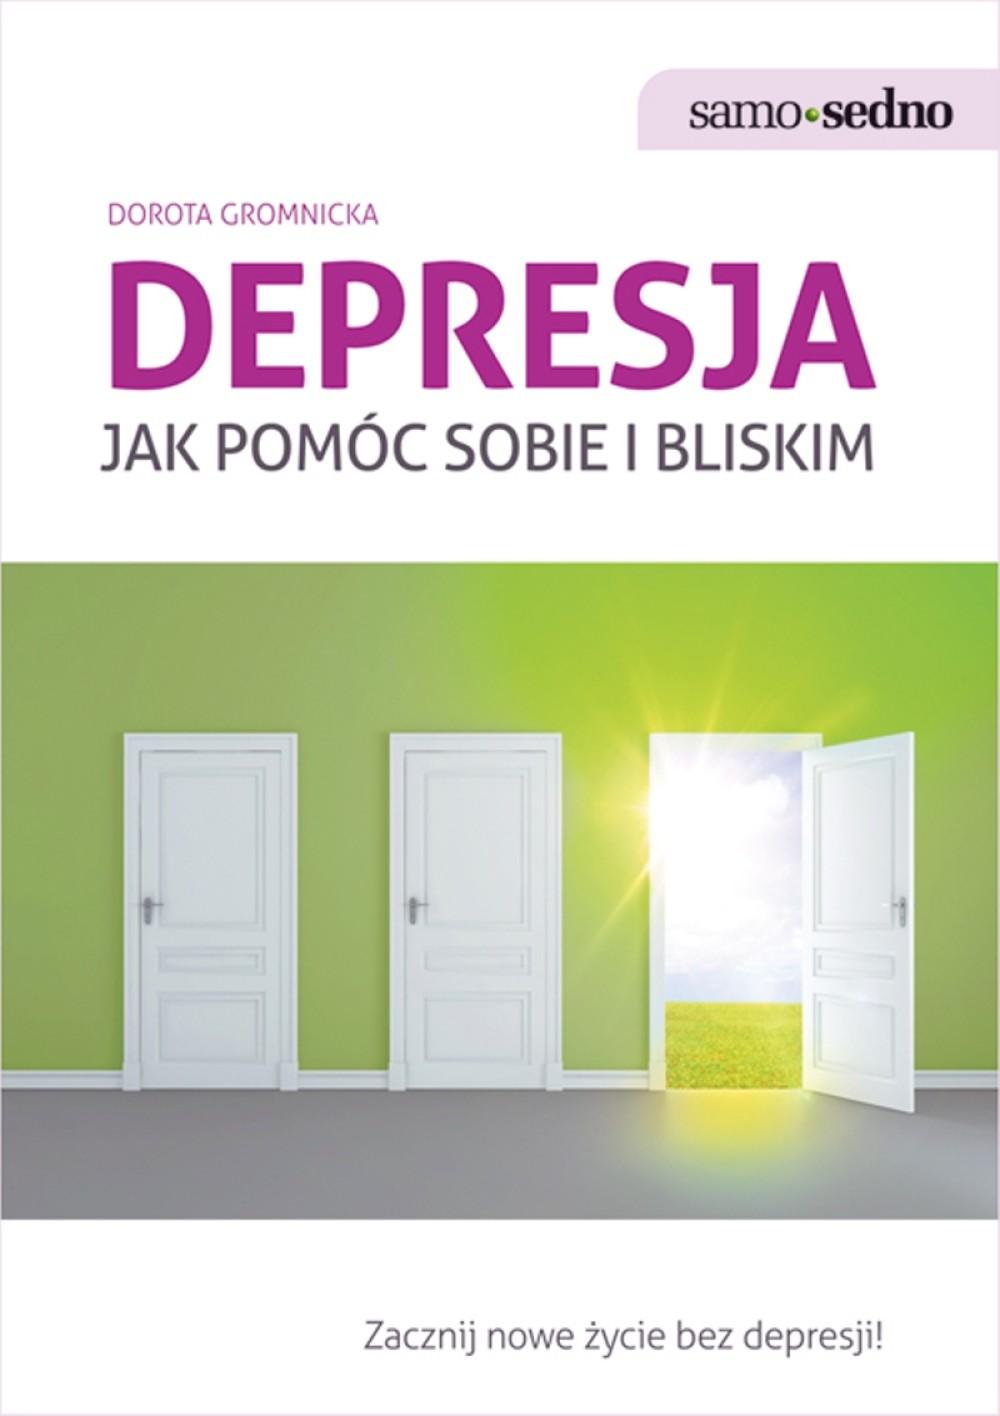 :: Samo Sedno - Depresja. Jak pomóc sobie i bliskim - e-book ::